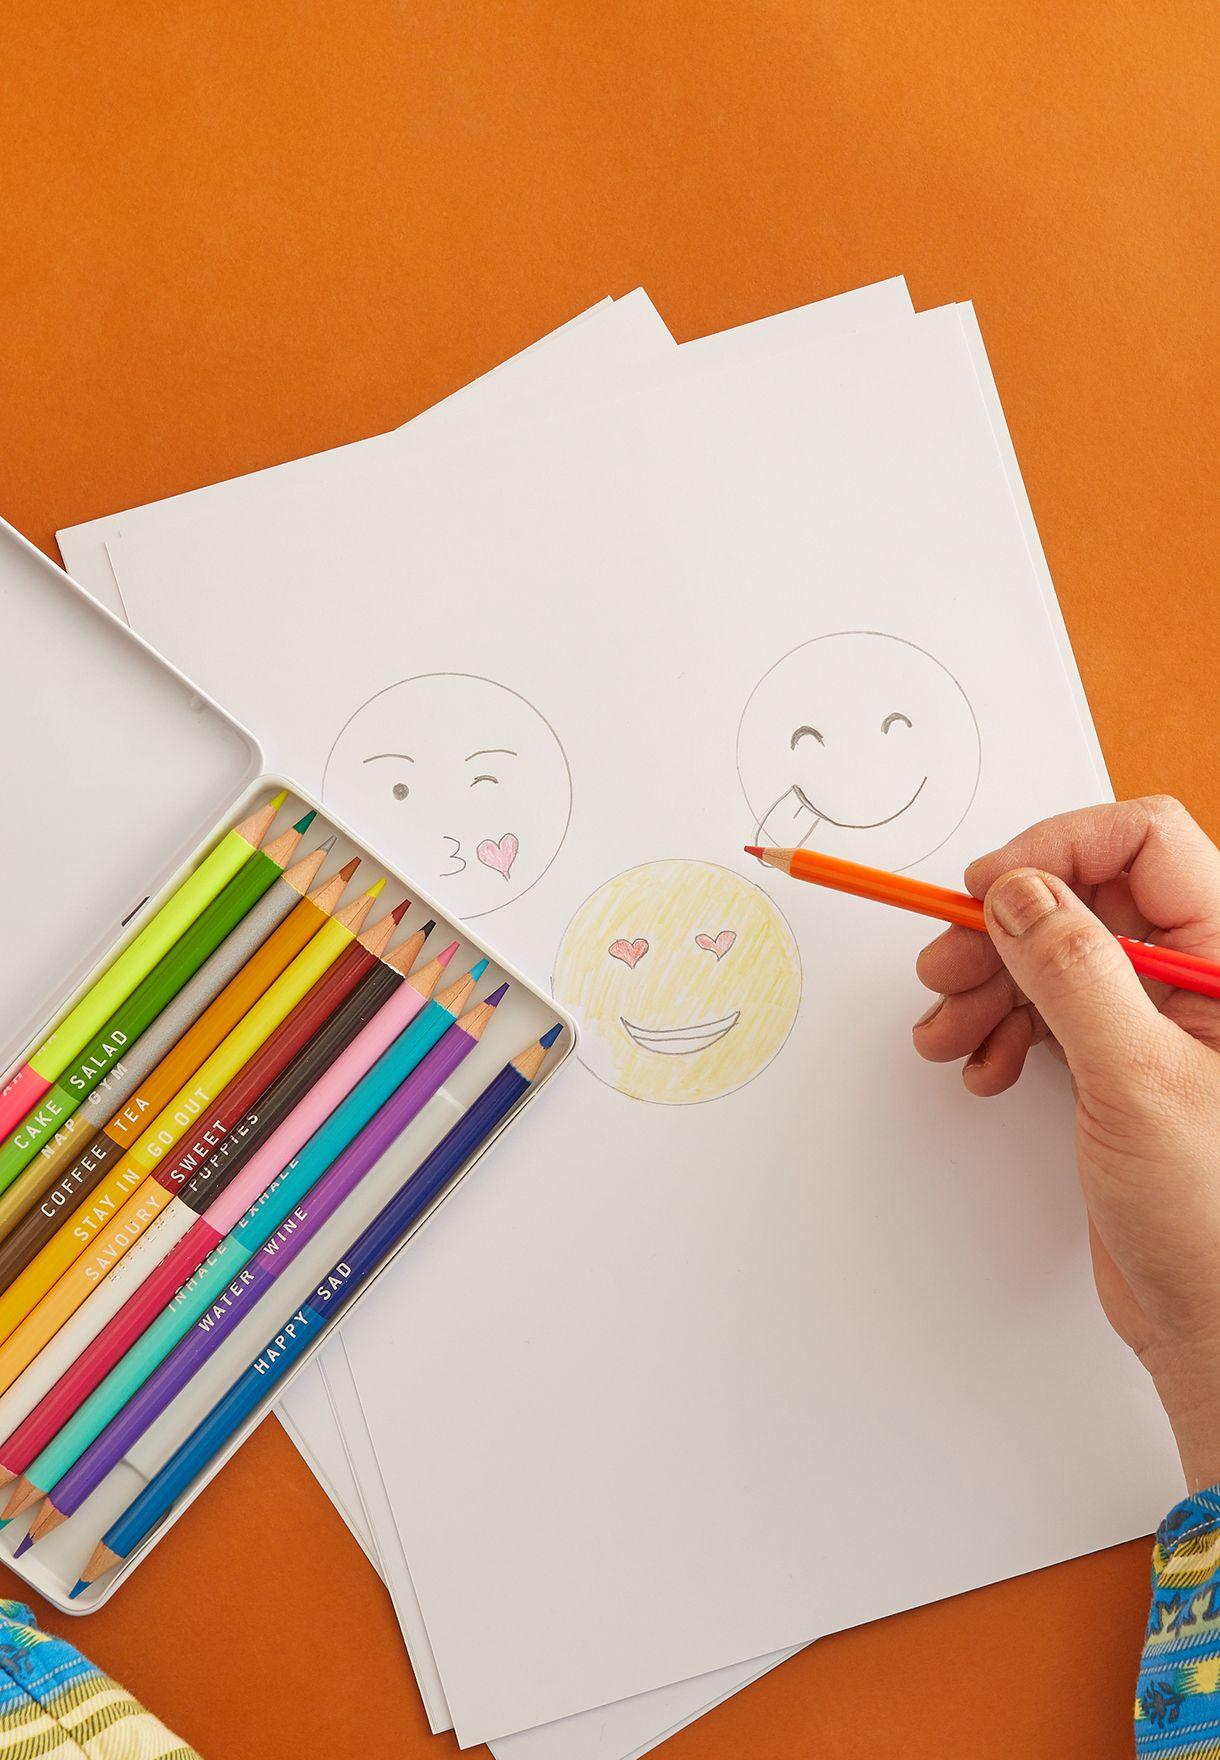 Mixed Emotions - Colouring Pencils